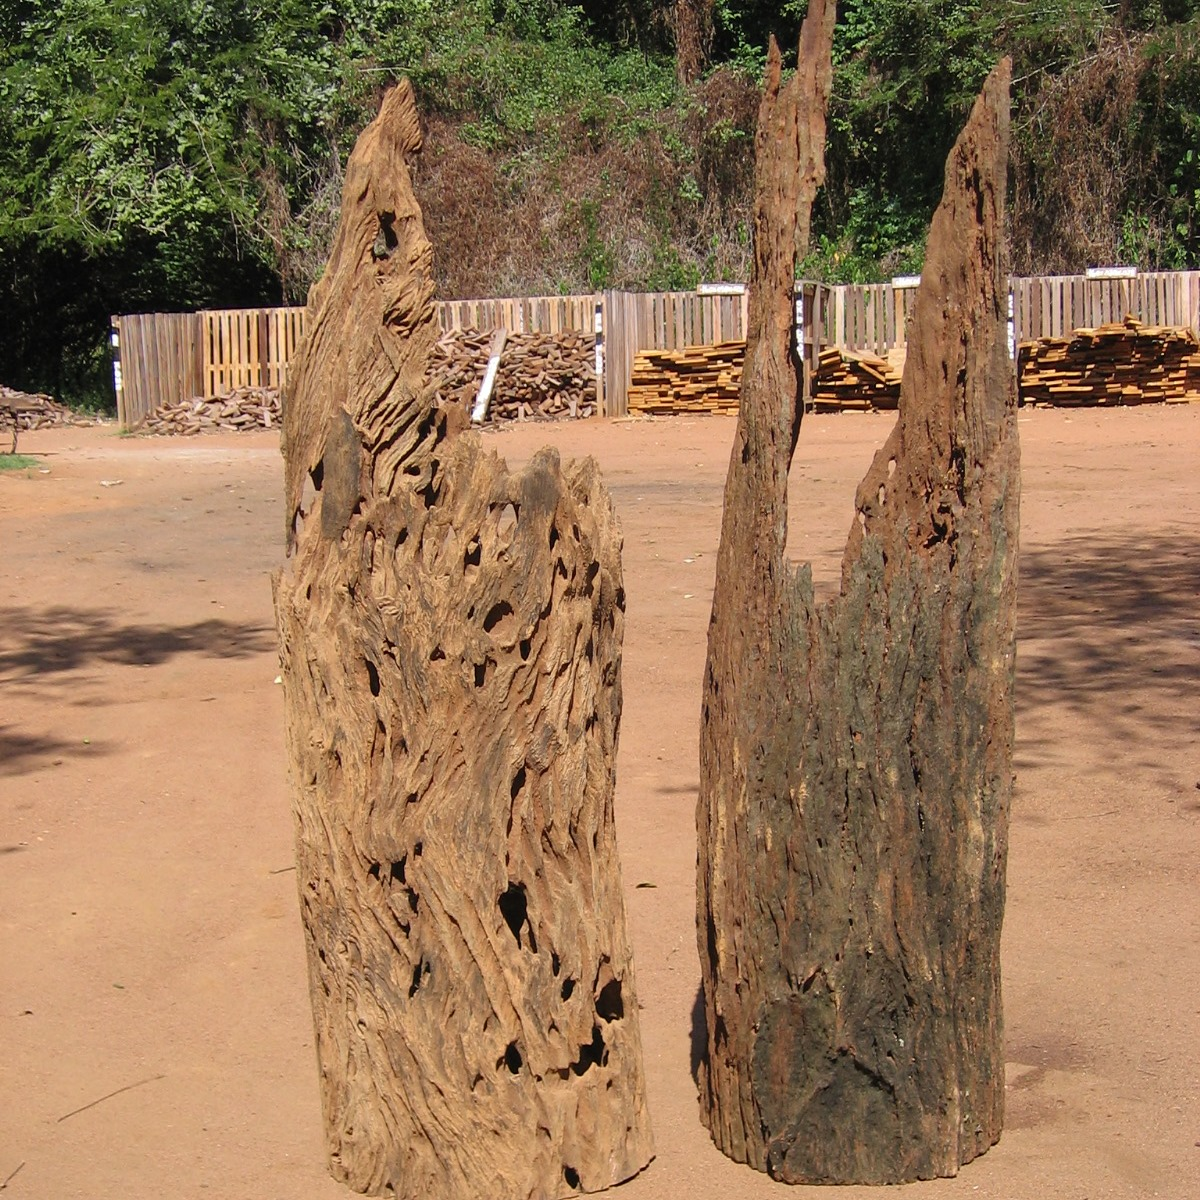 Troncos ocos interessantes  - Interesting hollow trunks